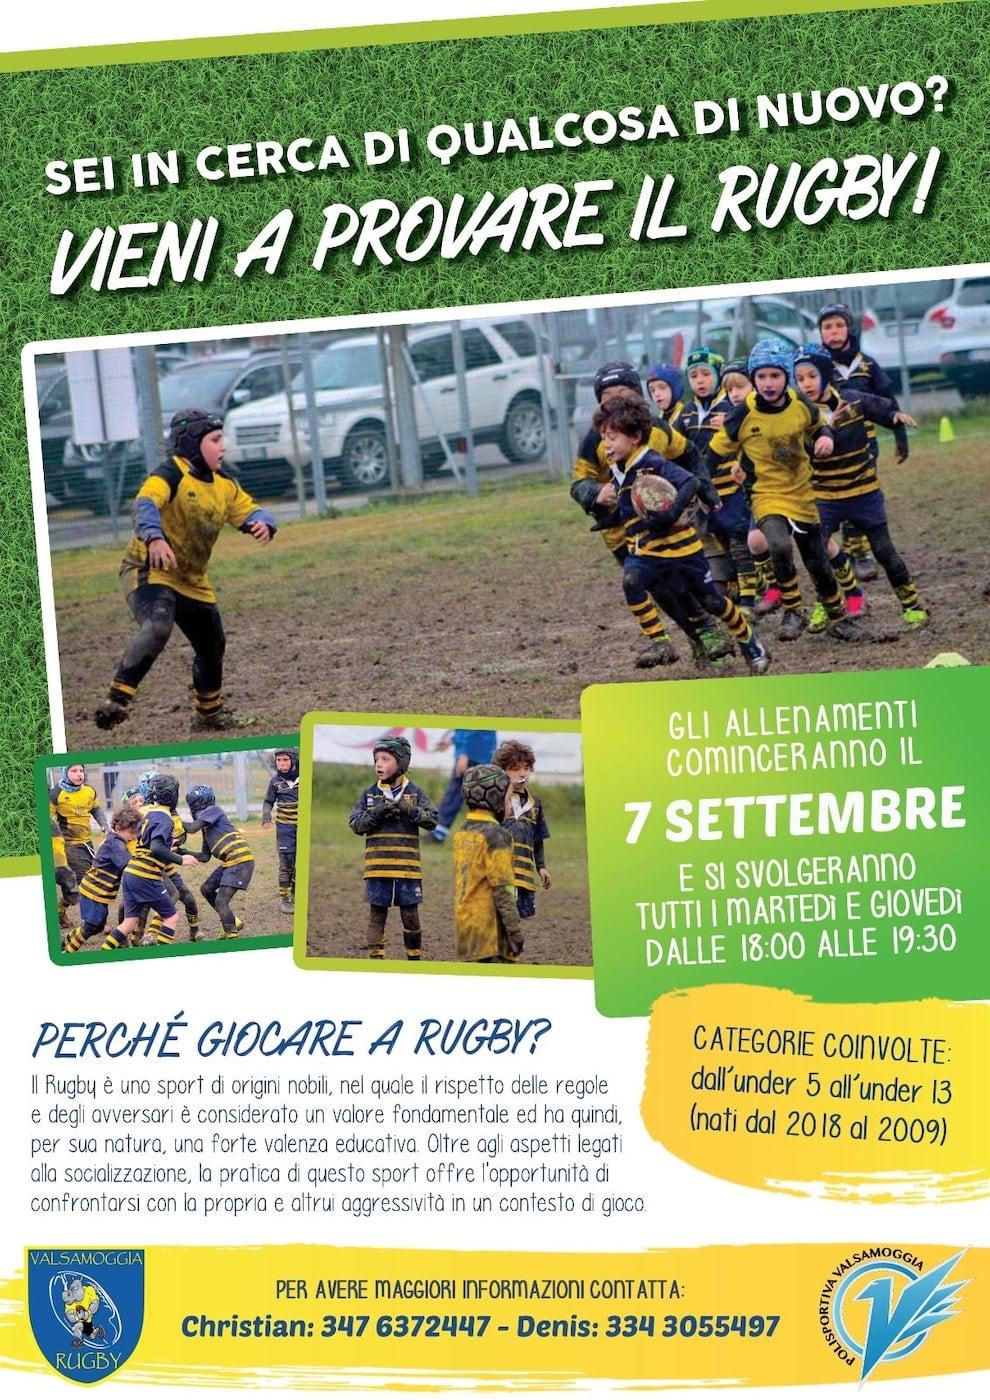 rugby-min-min